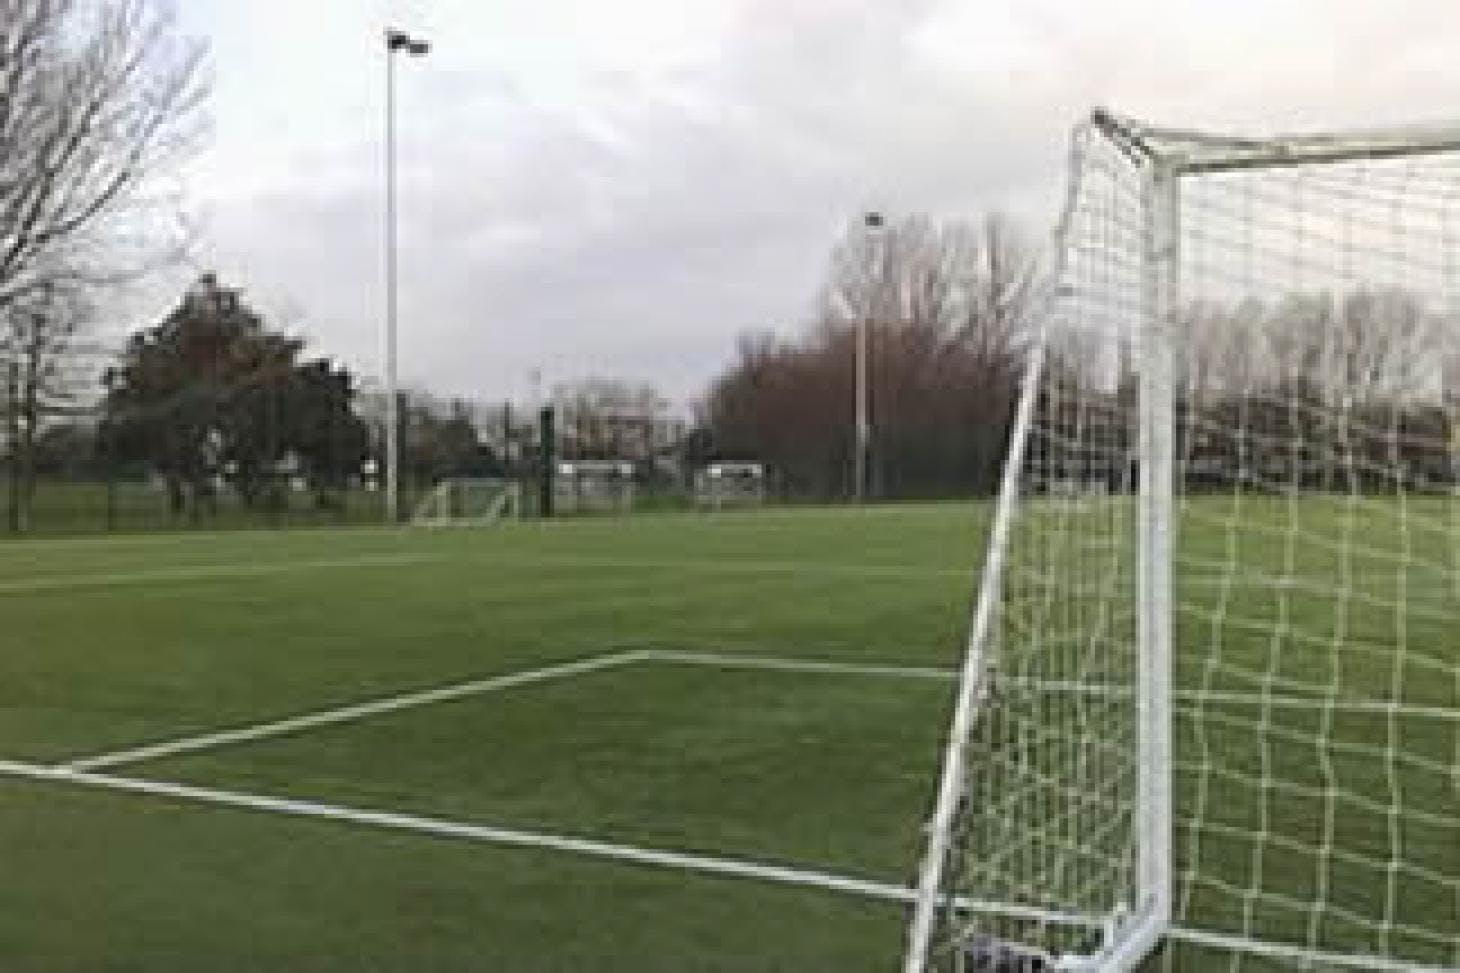 Irishtown Stadium 11 a side | Astroturf football pitch